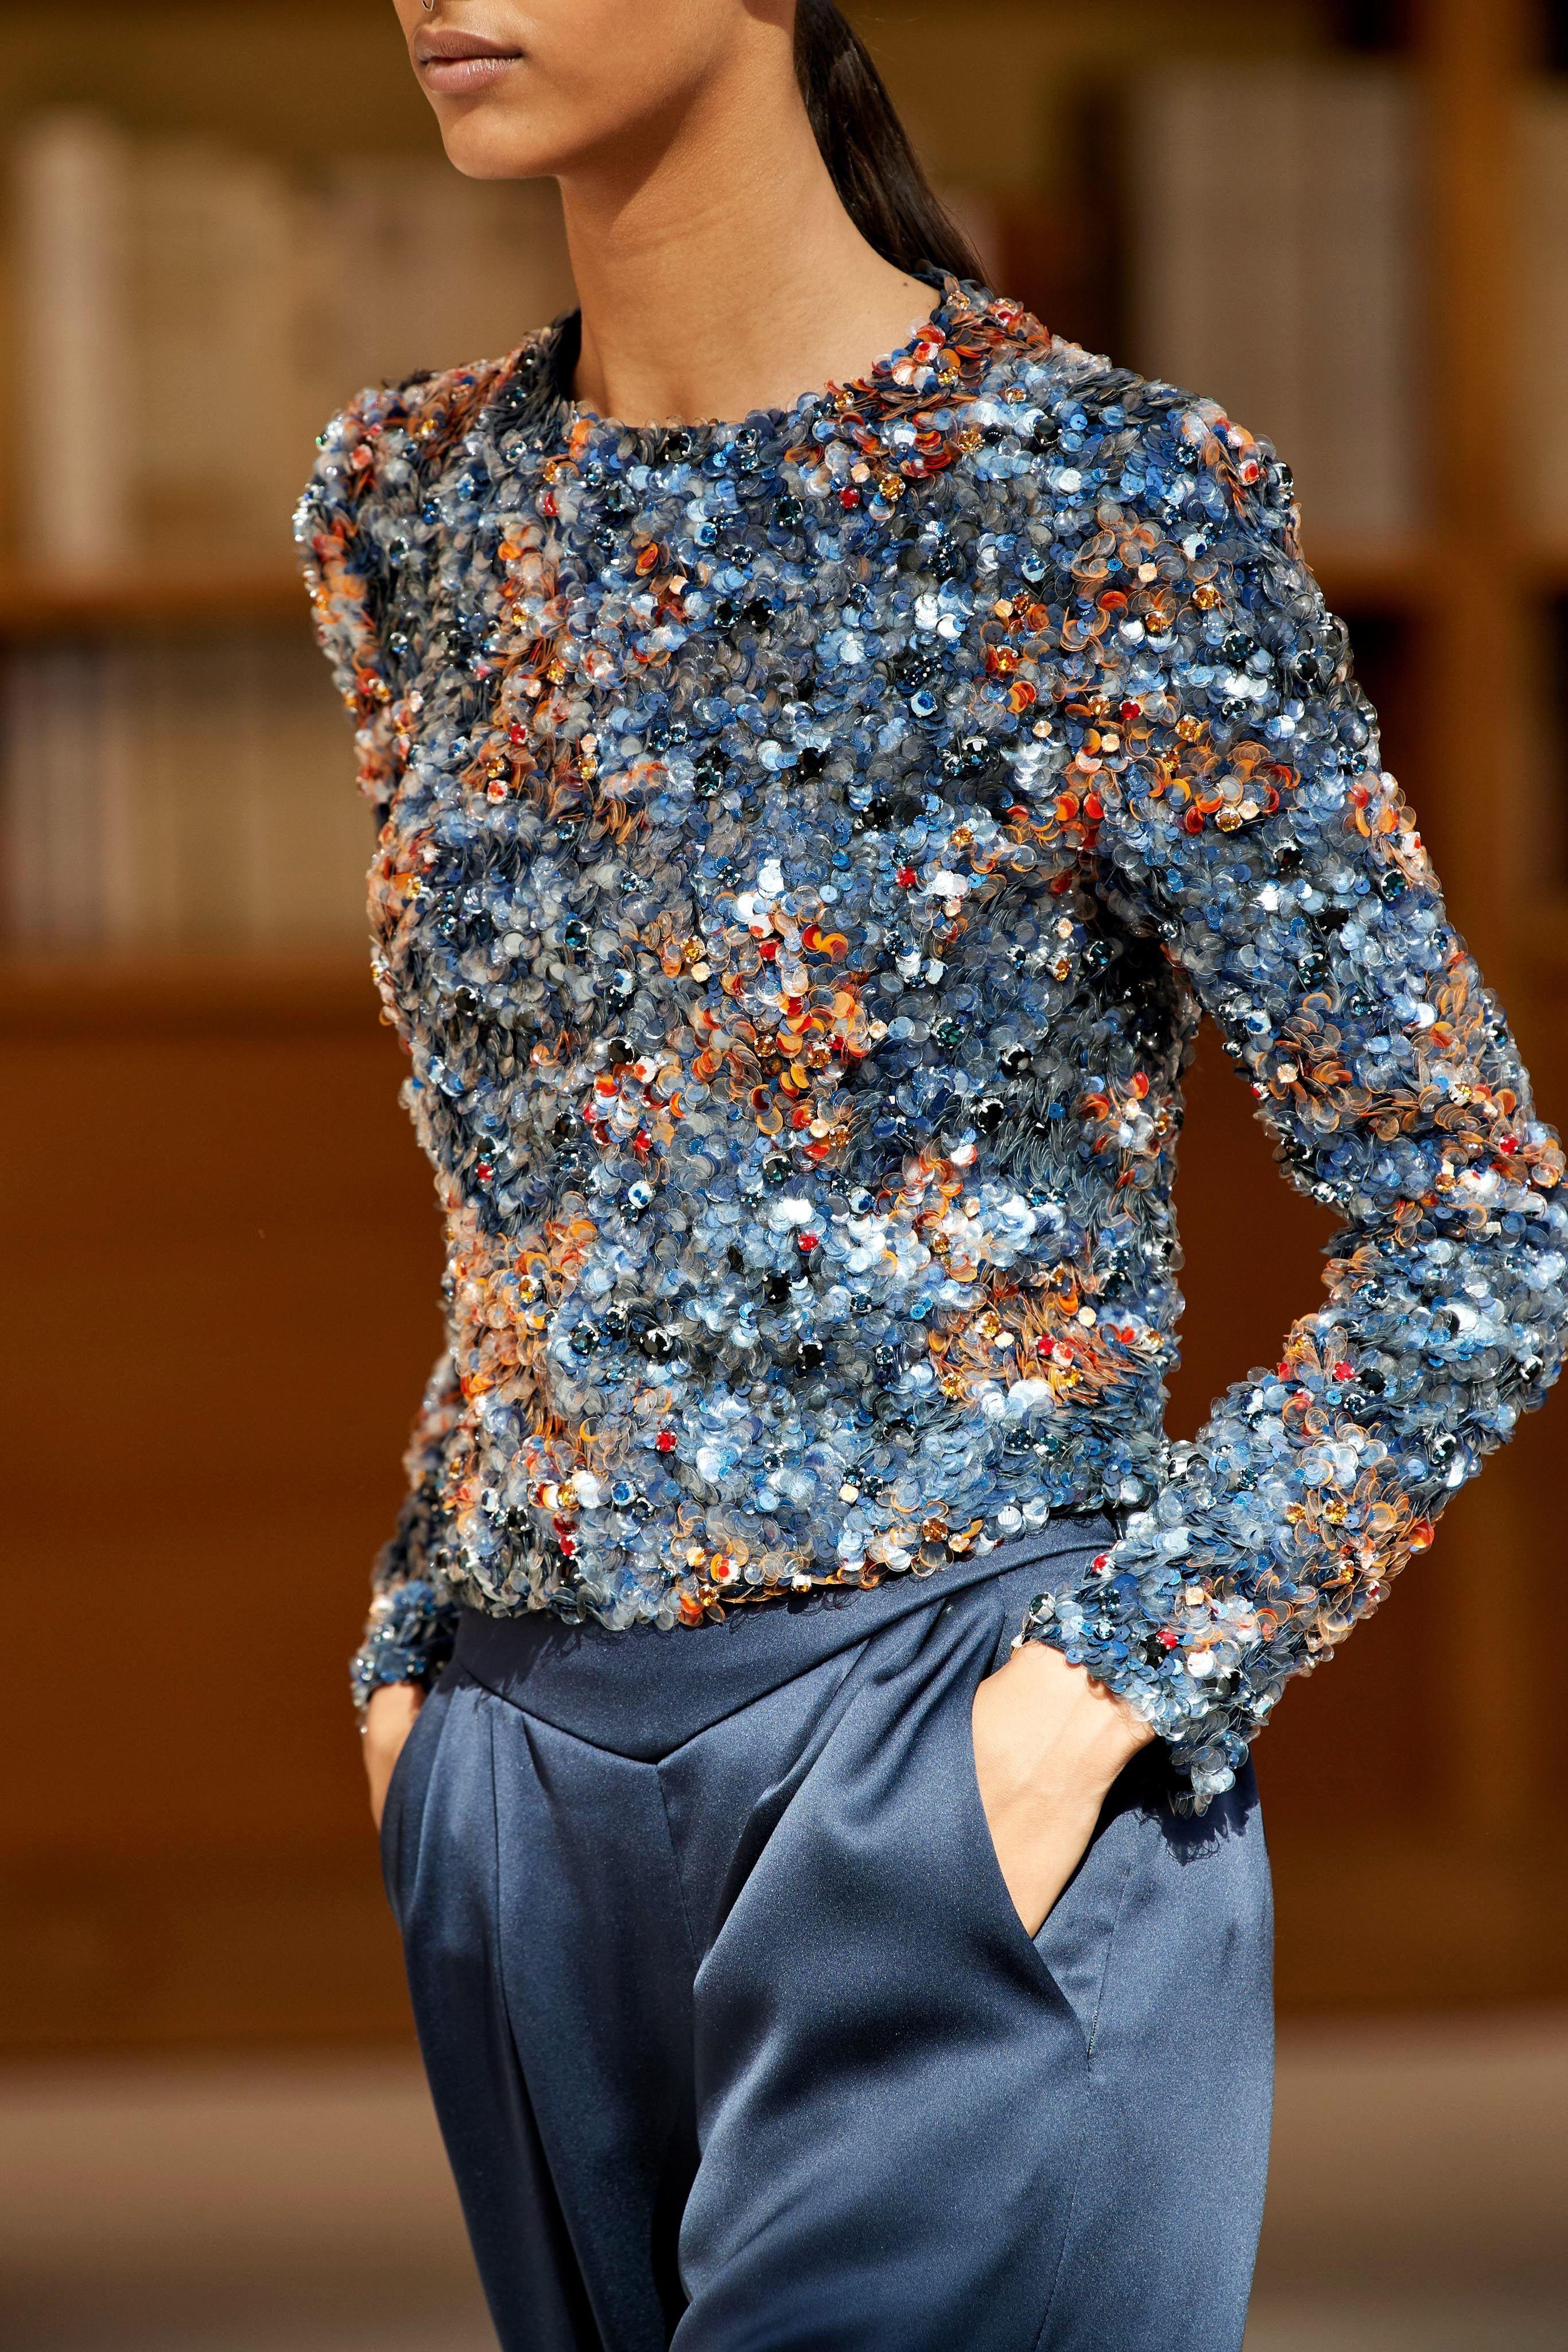 Colour combination with blouse, jeans